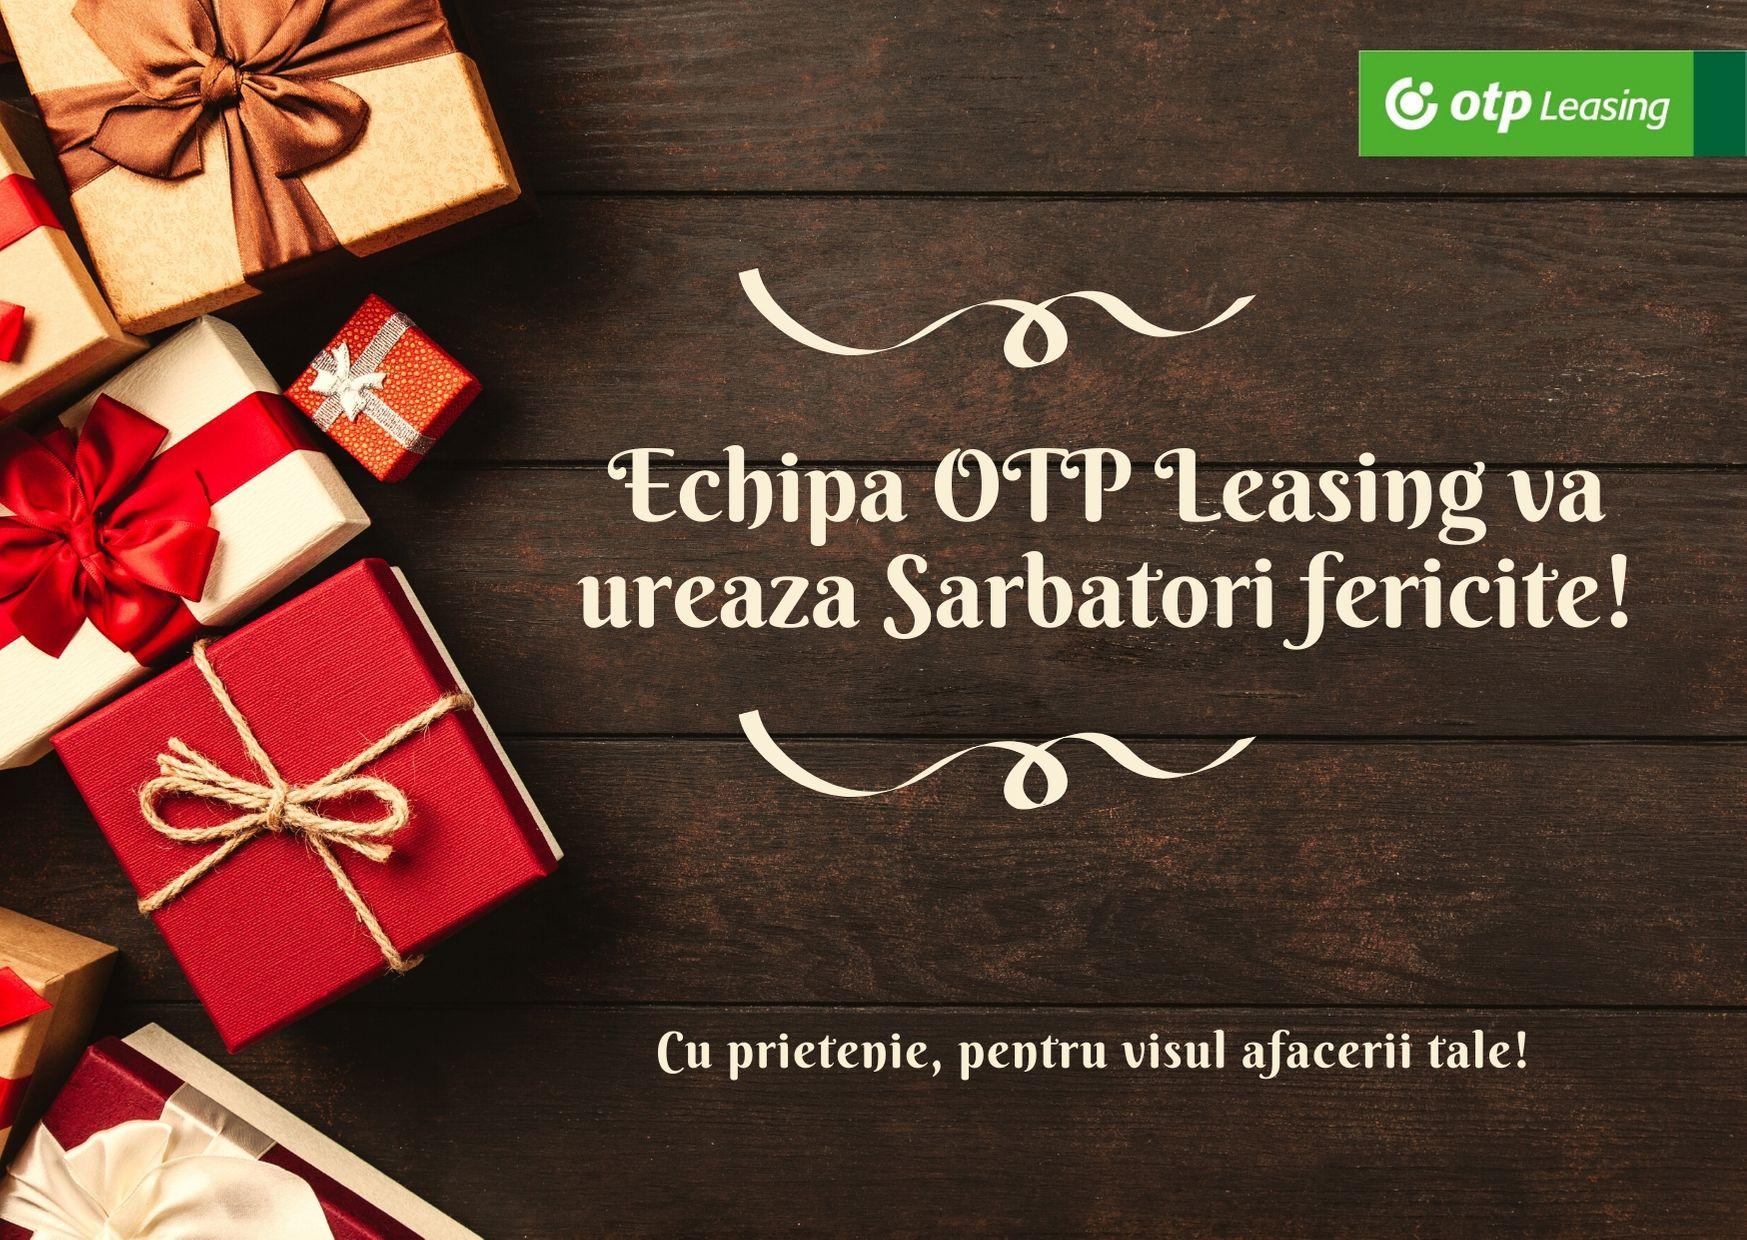 Sarbatori fericite din partea OTP Leasing Romania